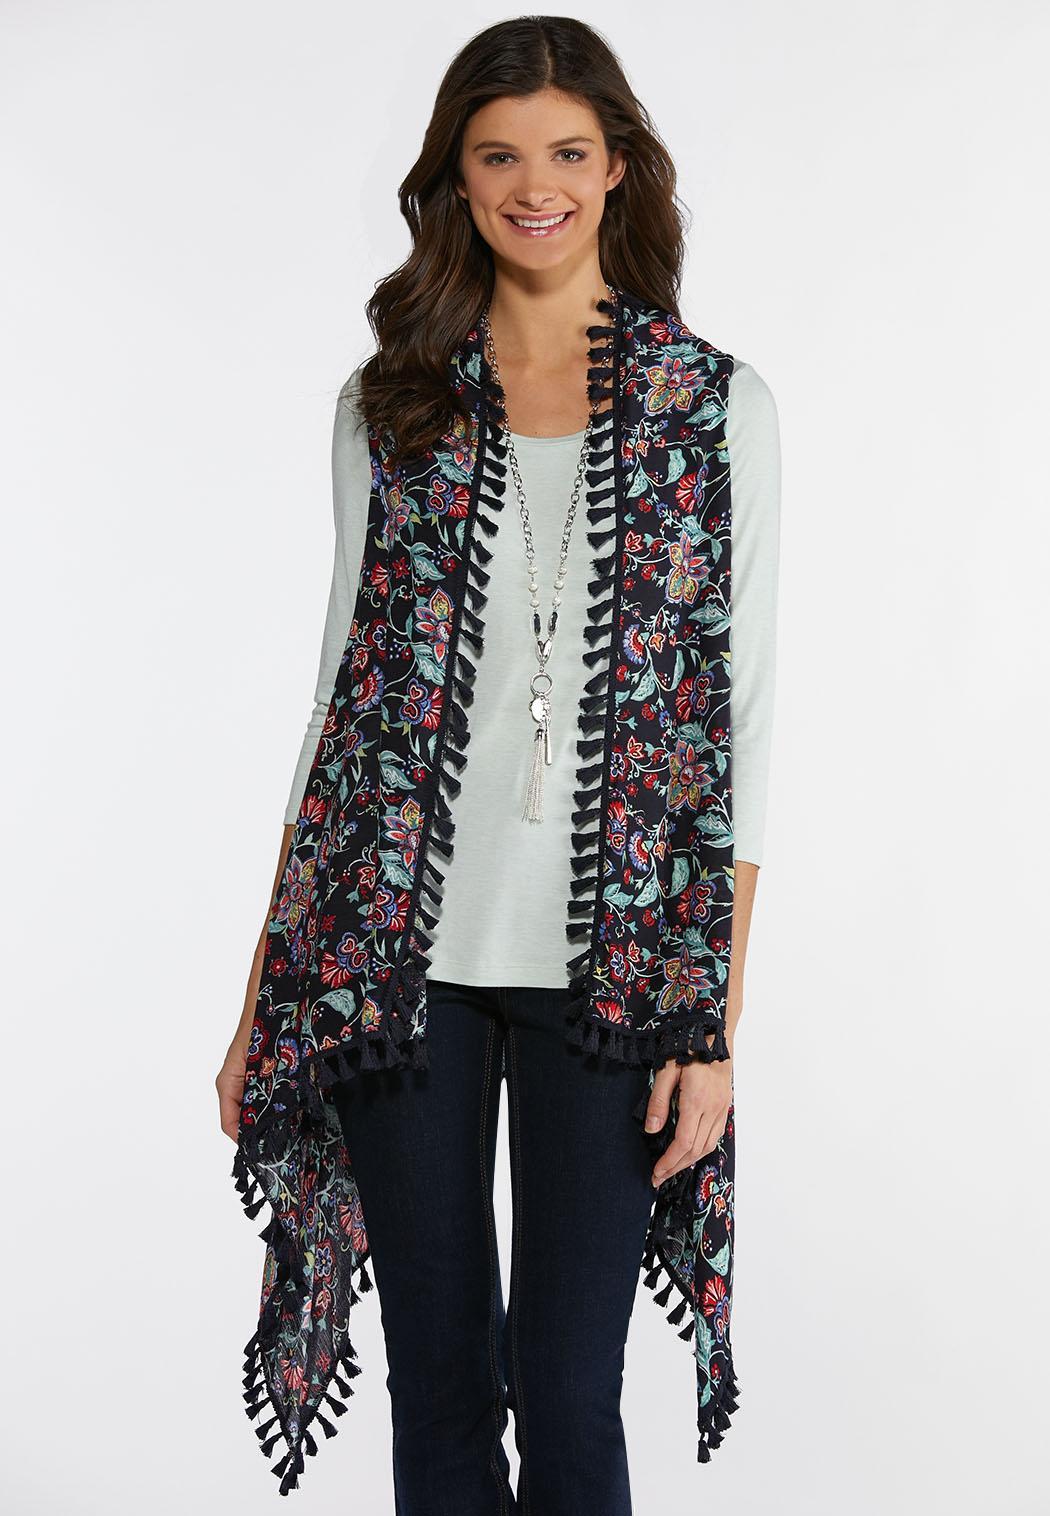 8c50571faed6 Plus Size Tasseled Country Floral Vest Vests Cato Fashions